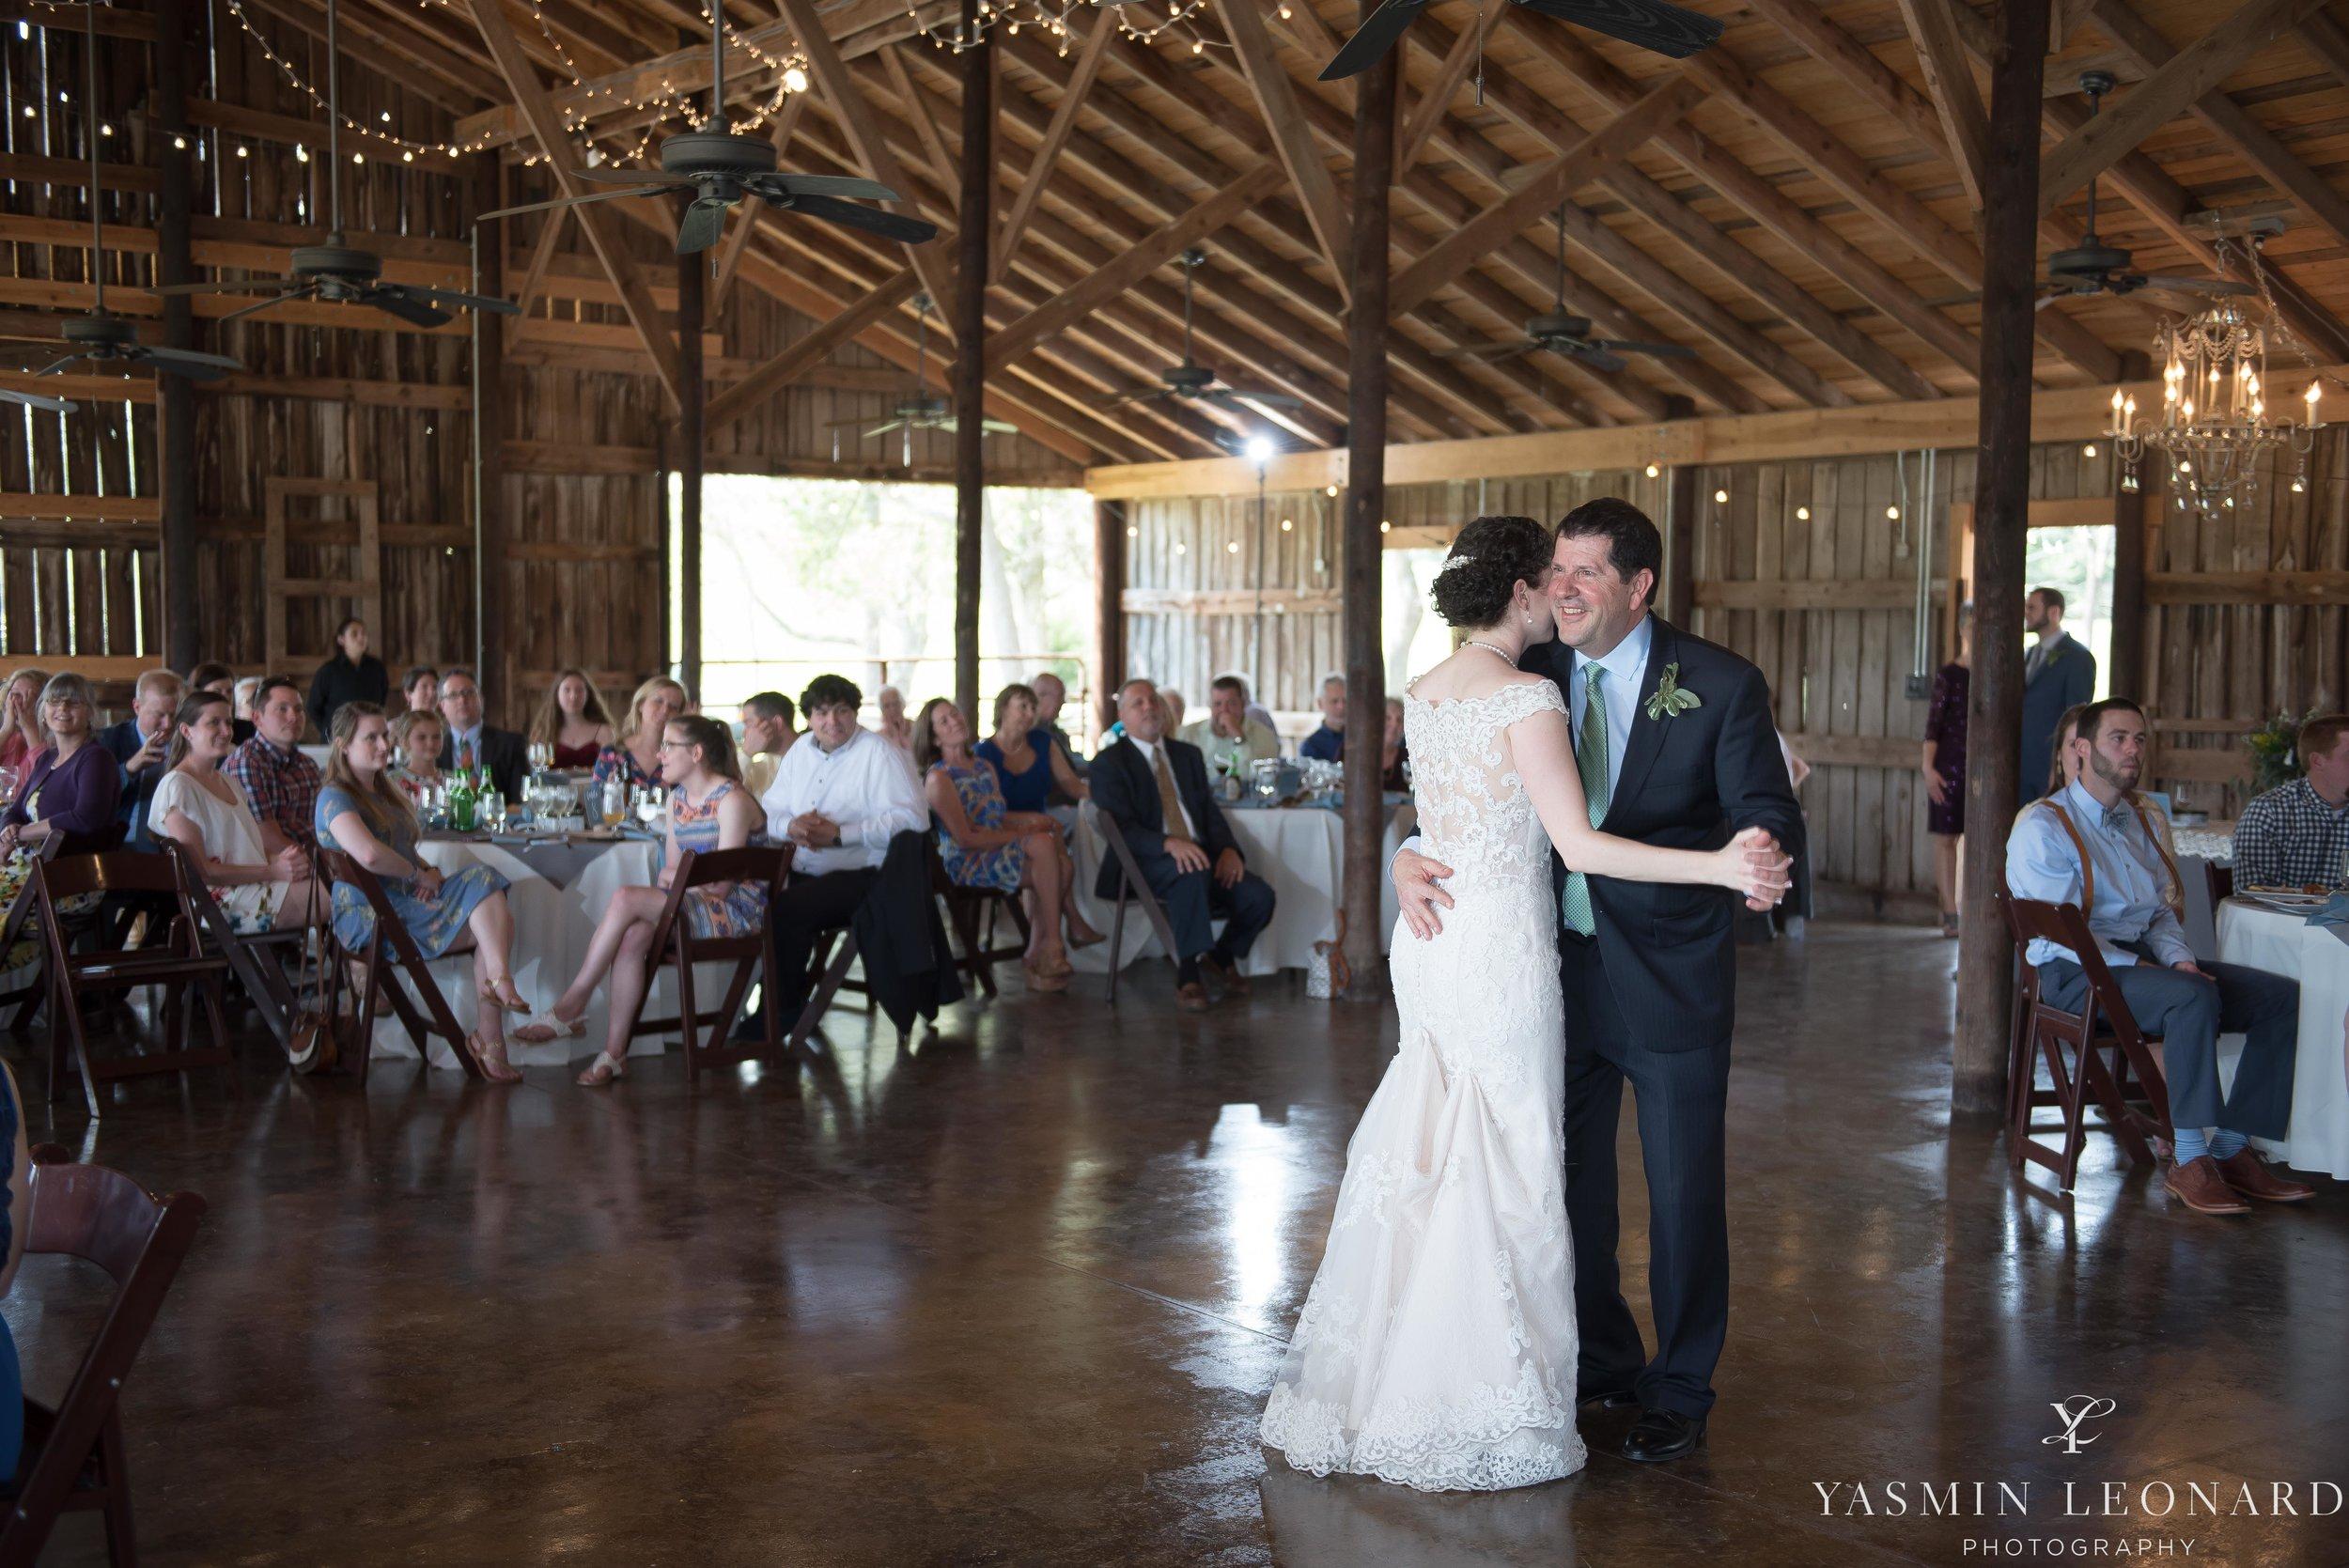 Courtney and Justin - L'abri at Linwood - Yasmin Leonard Photography-55.jpg